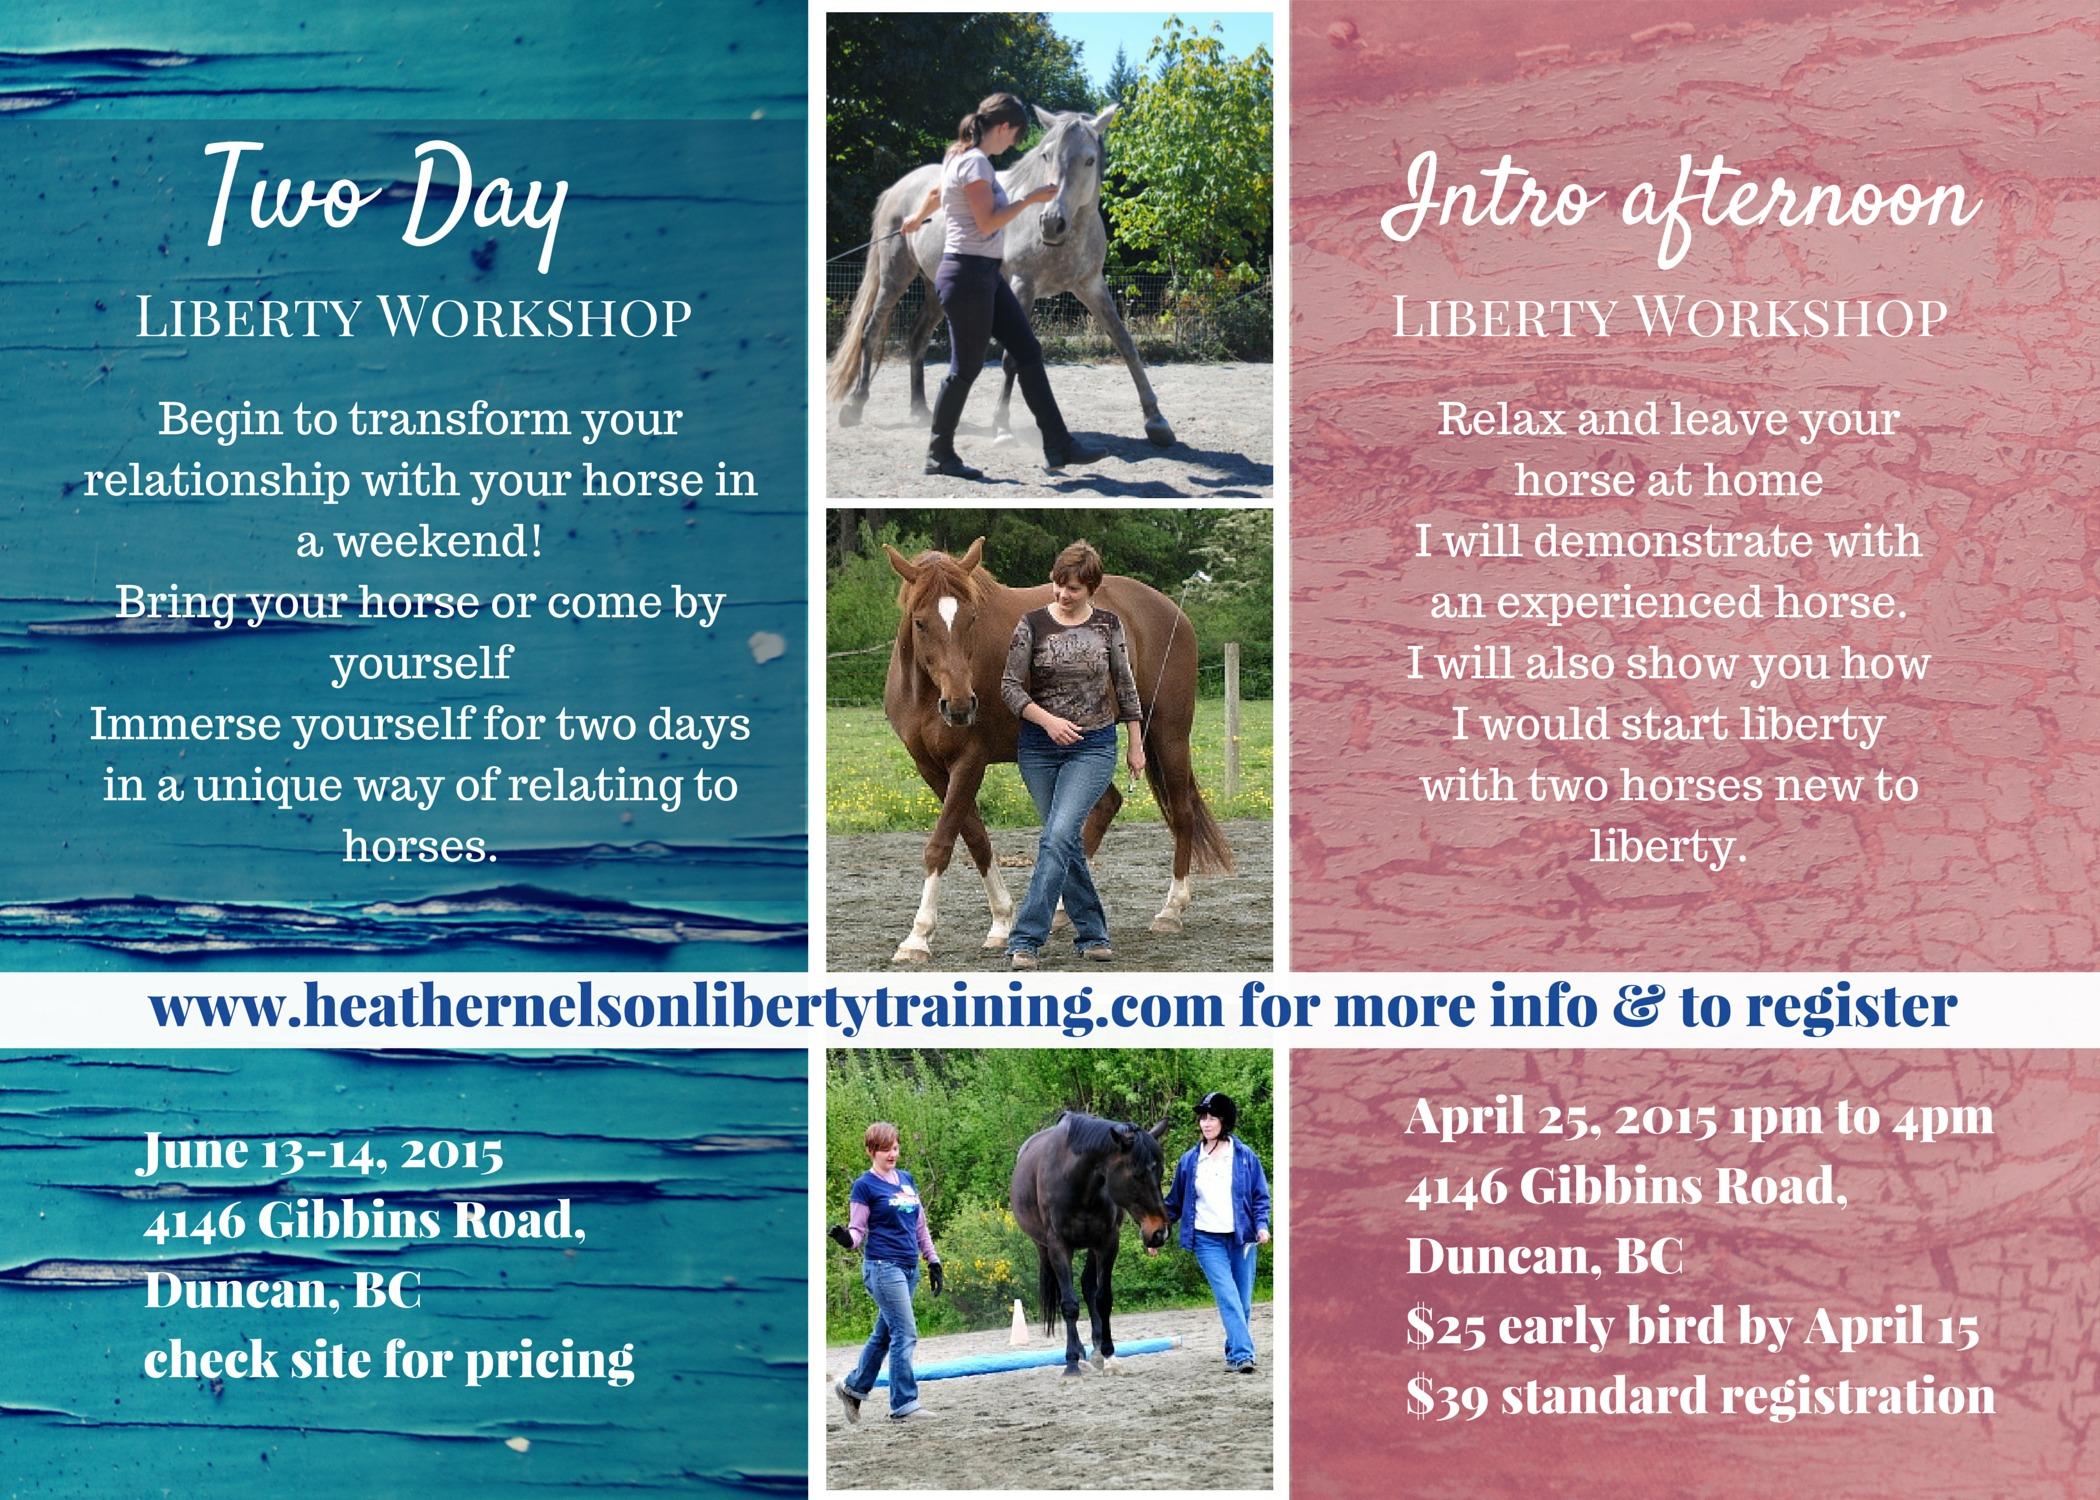 Heather_Nelson_Liberty_Workshop